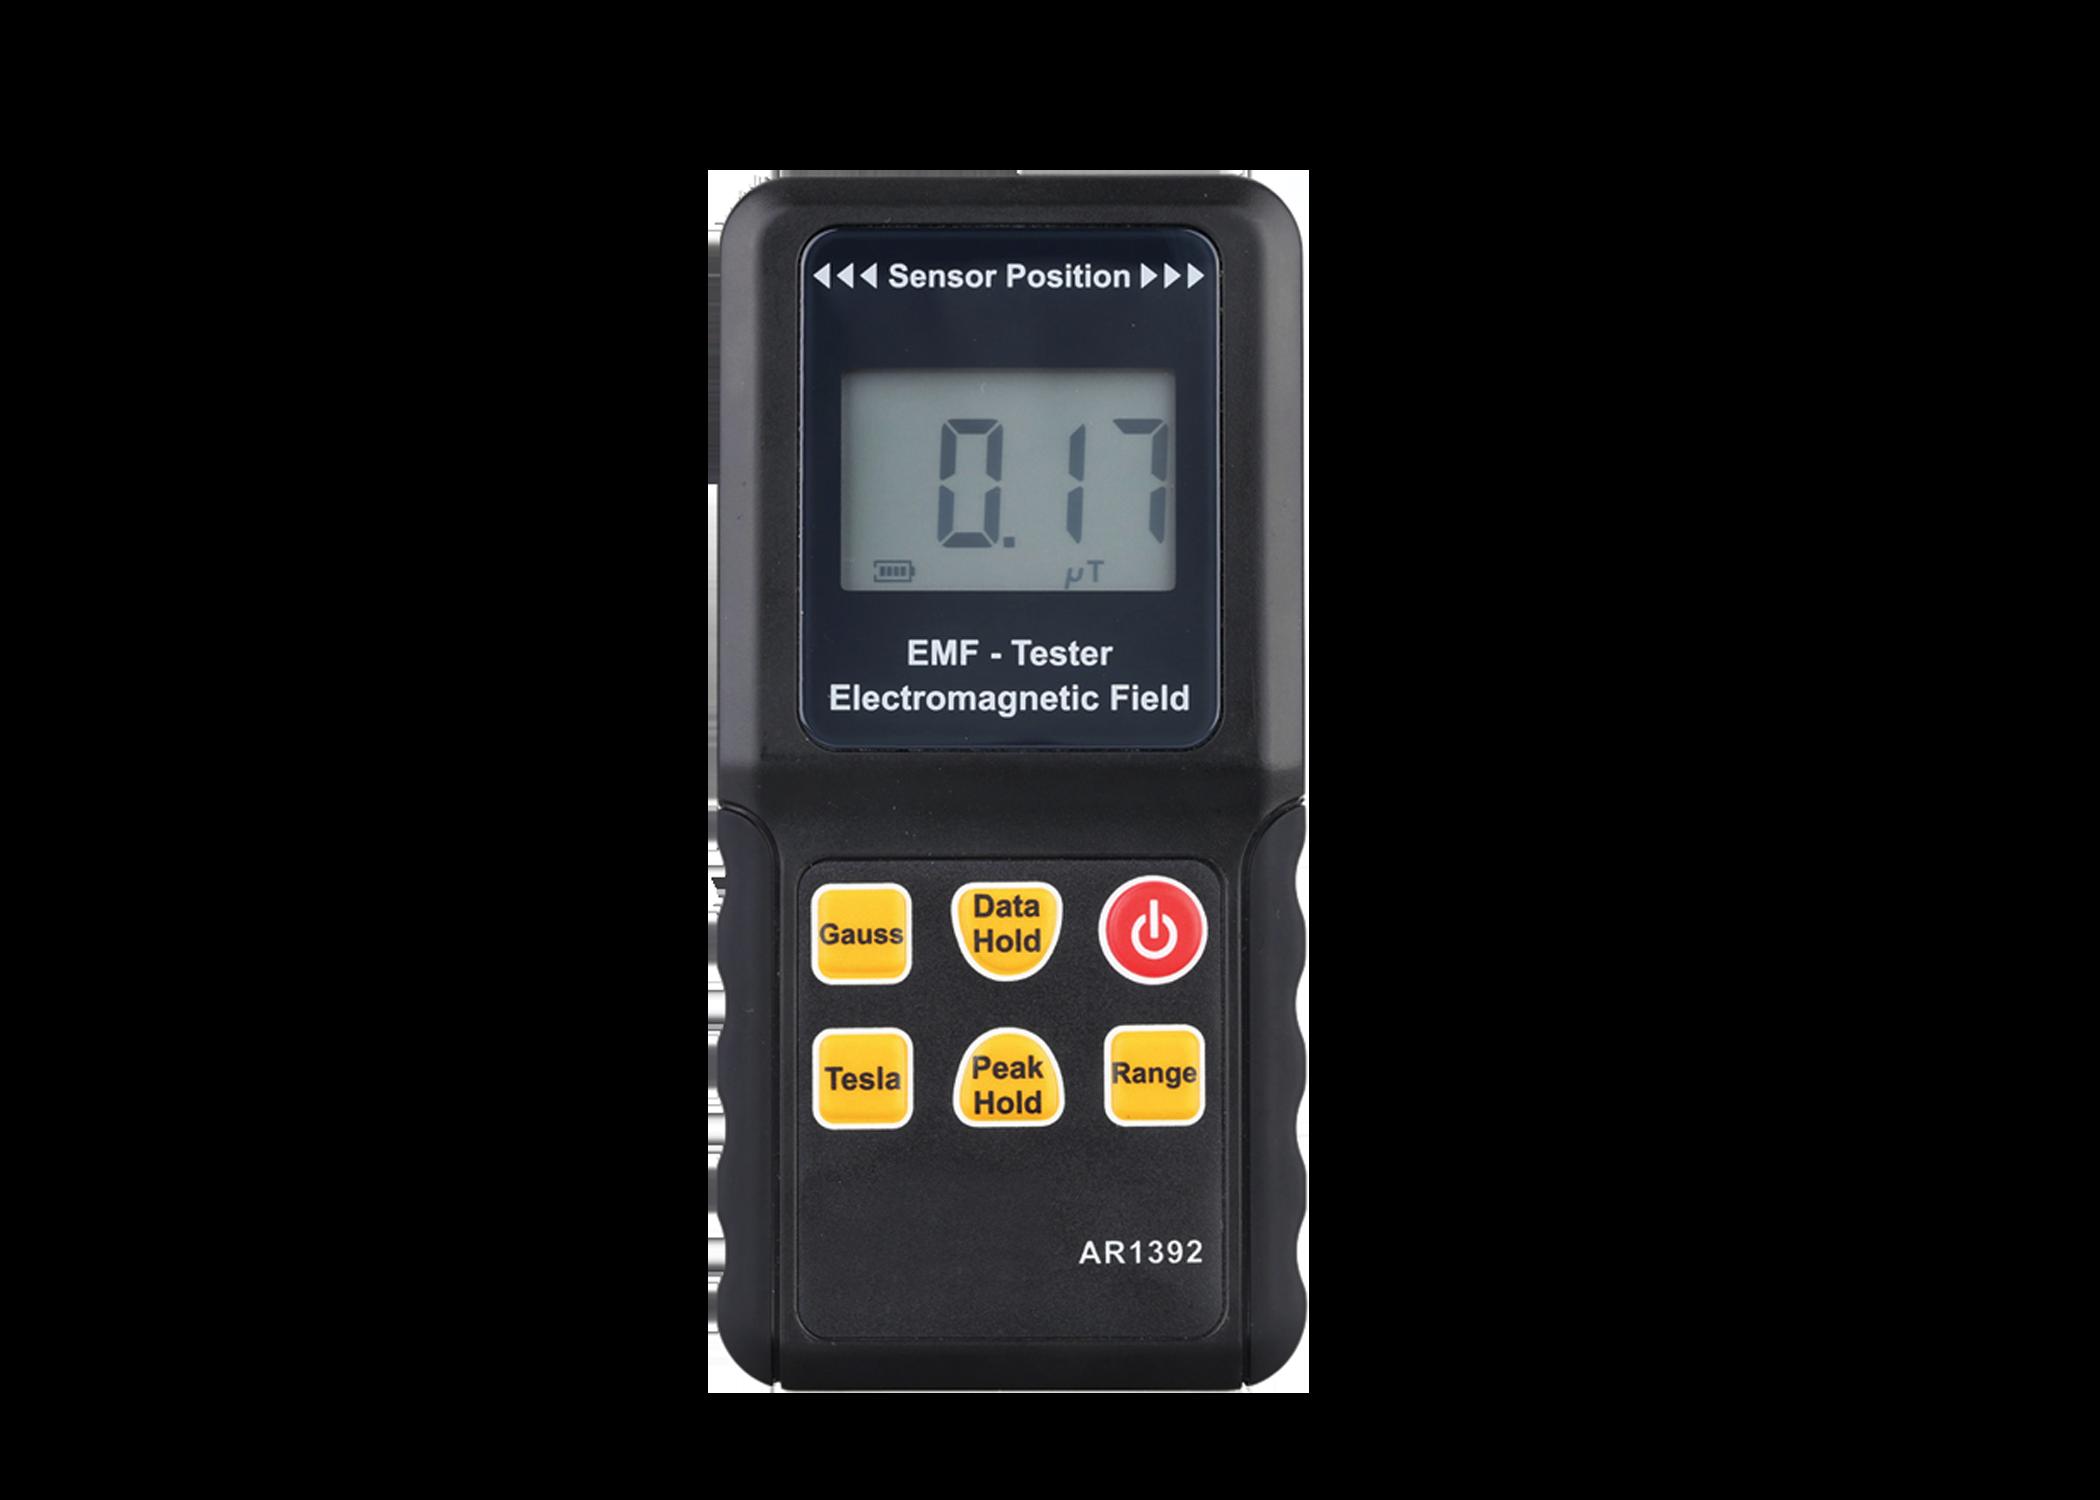 EMF Calibration